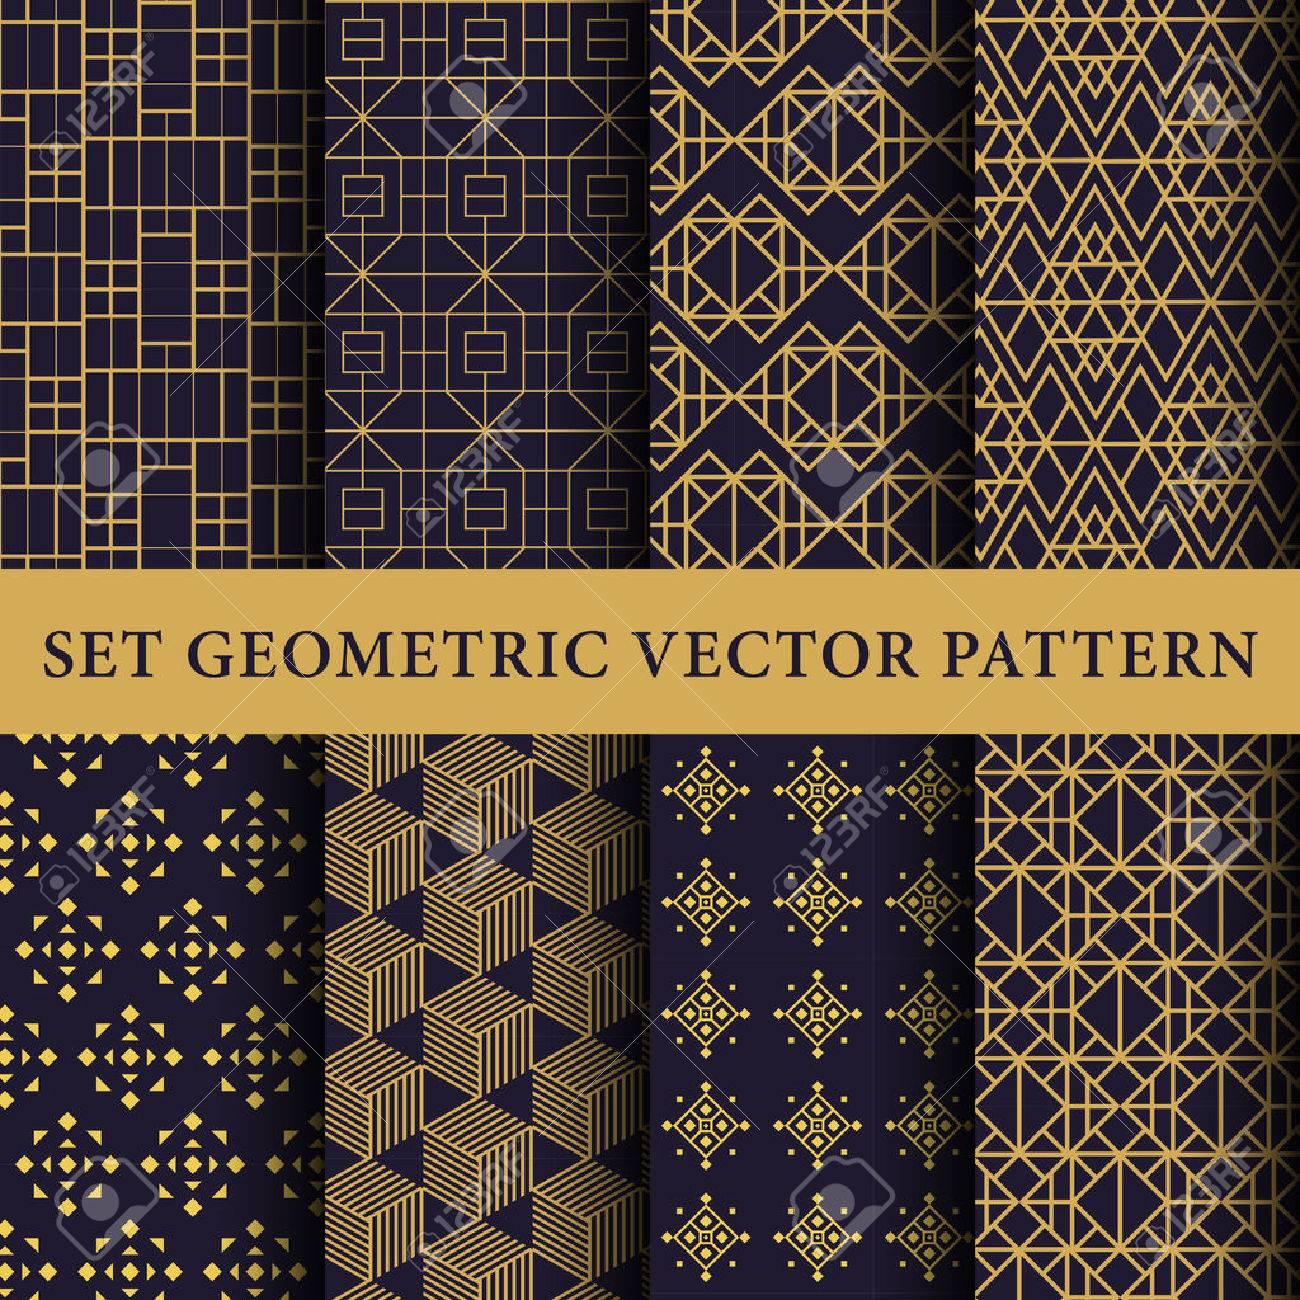 Luxury patterns pack - 40328519